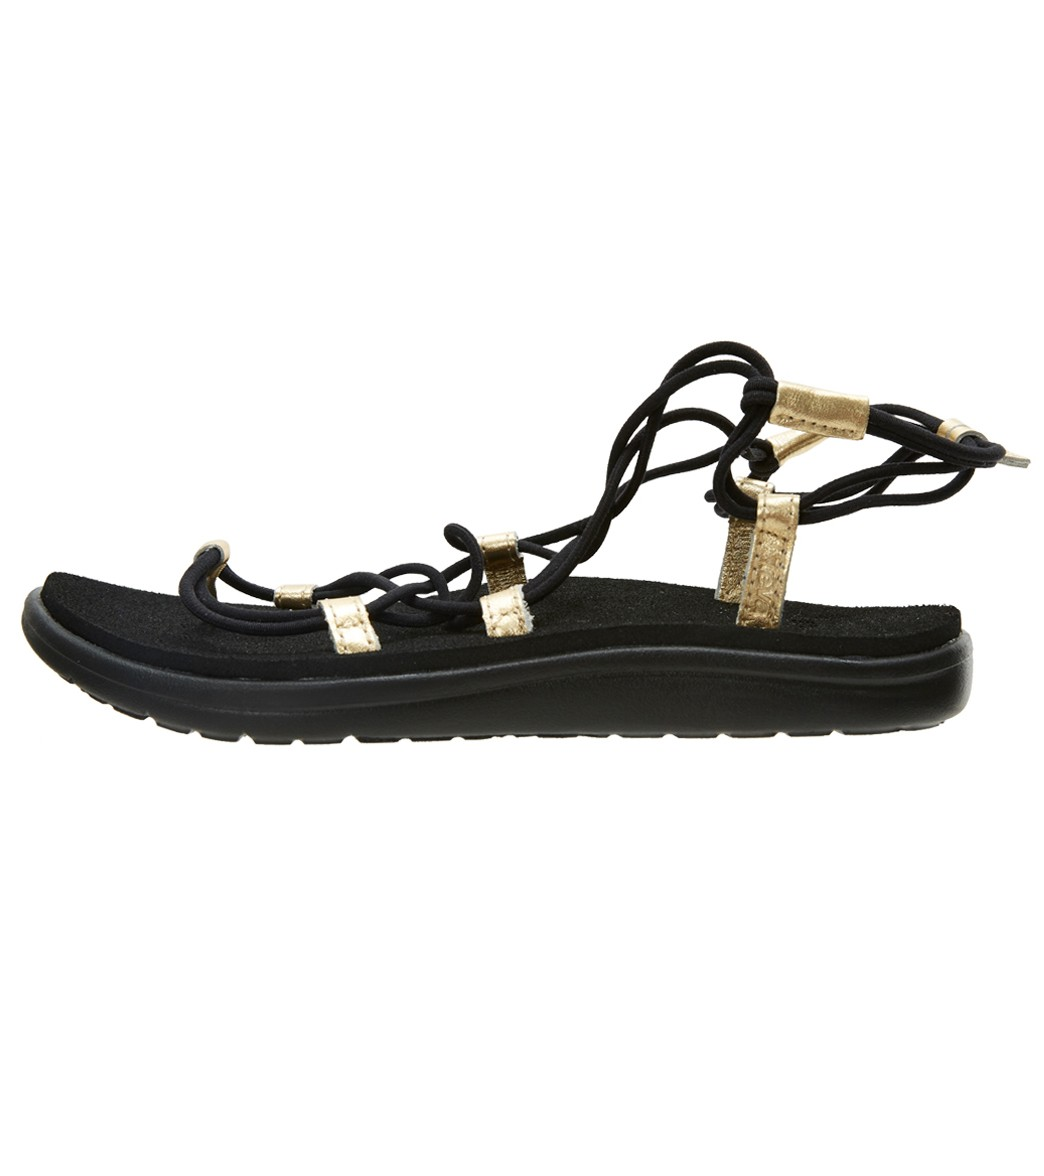 455d307972c9 Teva Voya Infinity Metallic Sandal at SwimOutlet.com